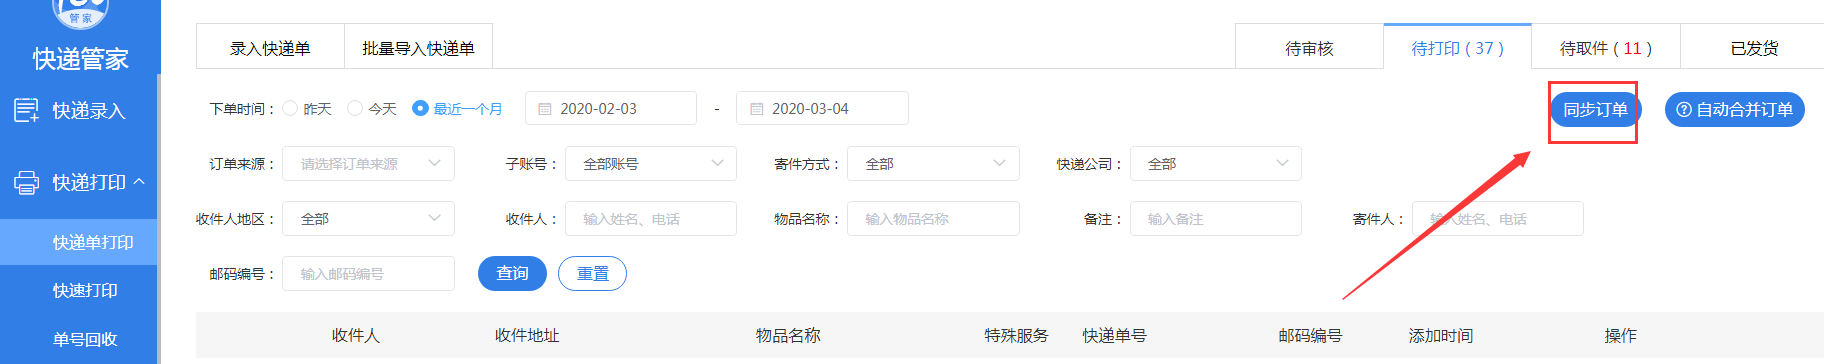 QQ图片20200304121213.png